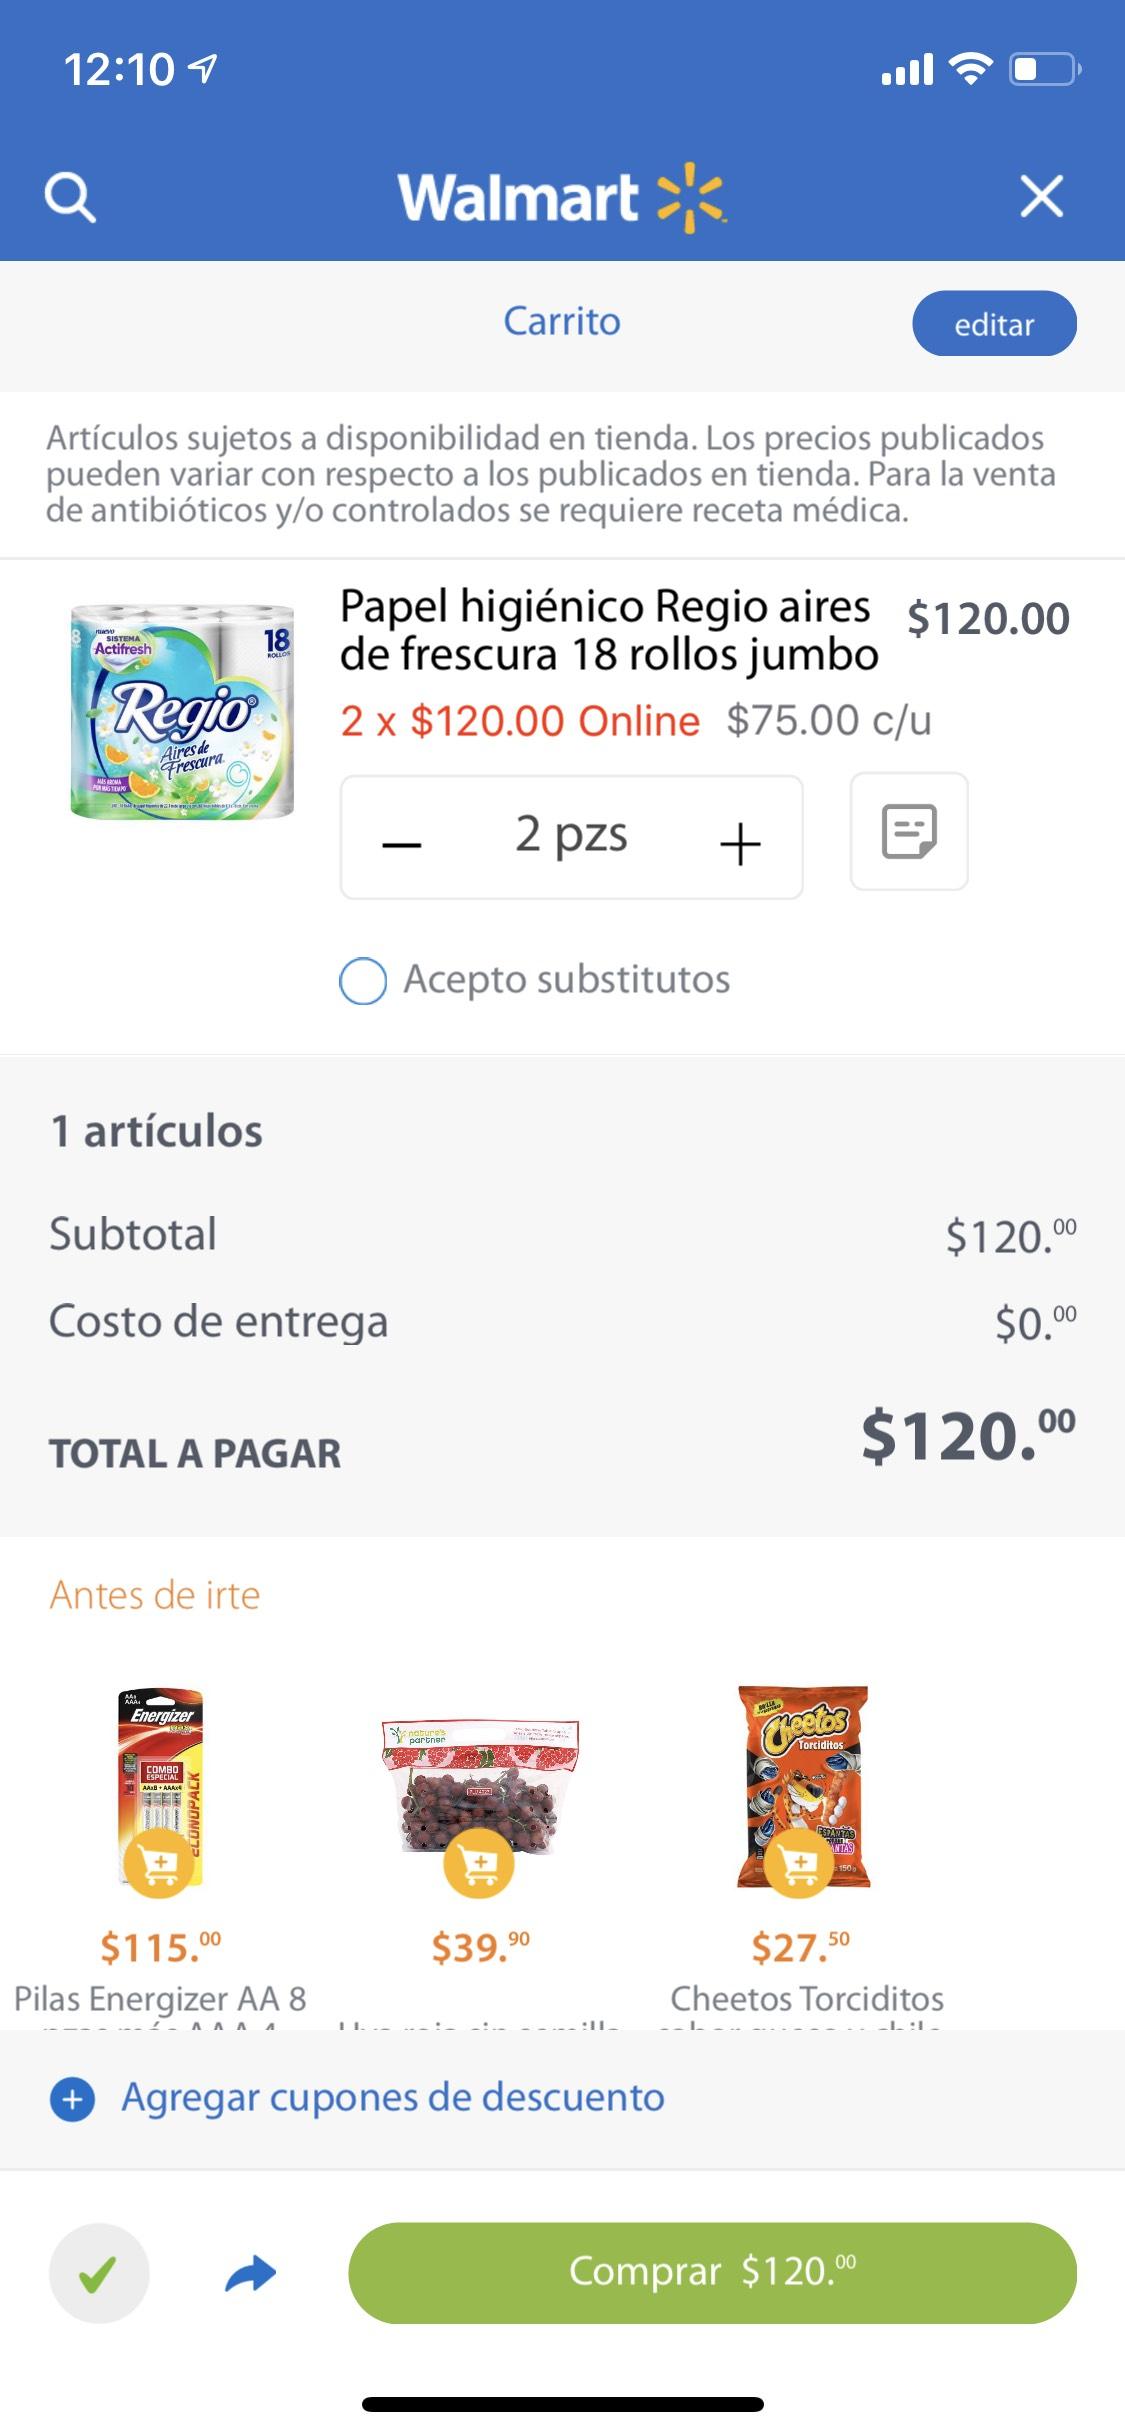 Walmart: Papel higiénico Regio aires de frescura 18 rollos jumbo (2x$120)